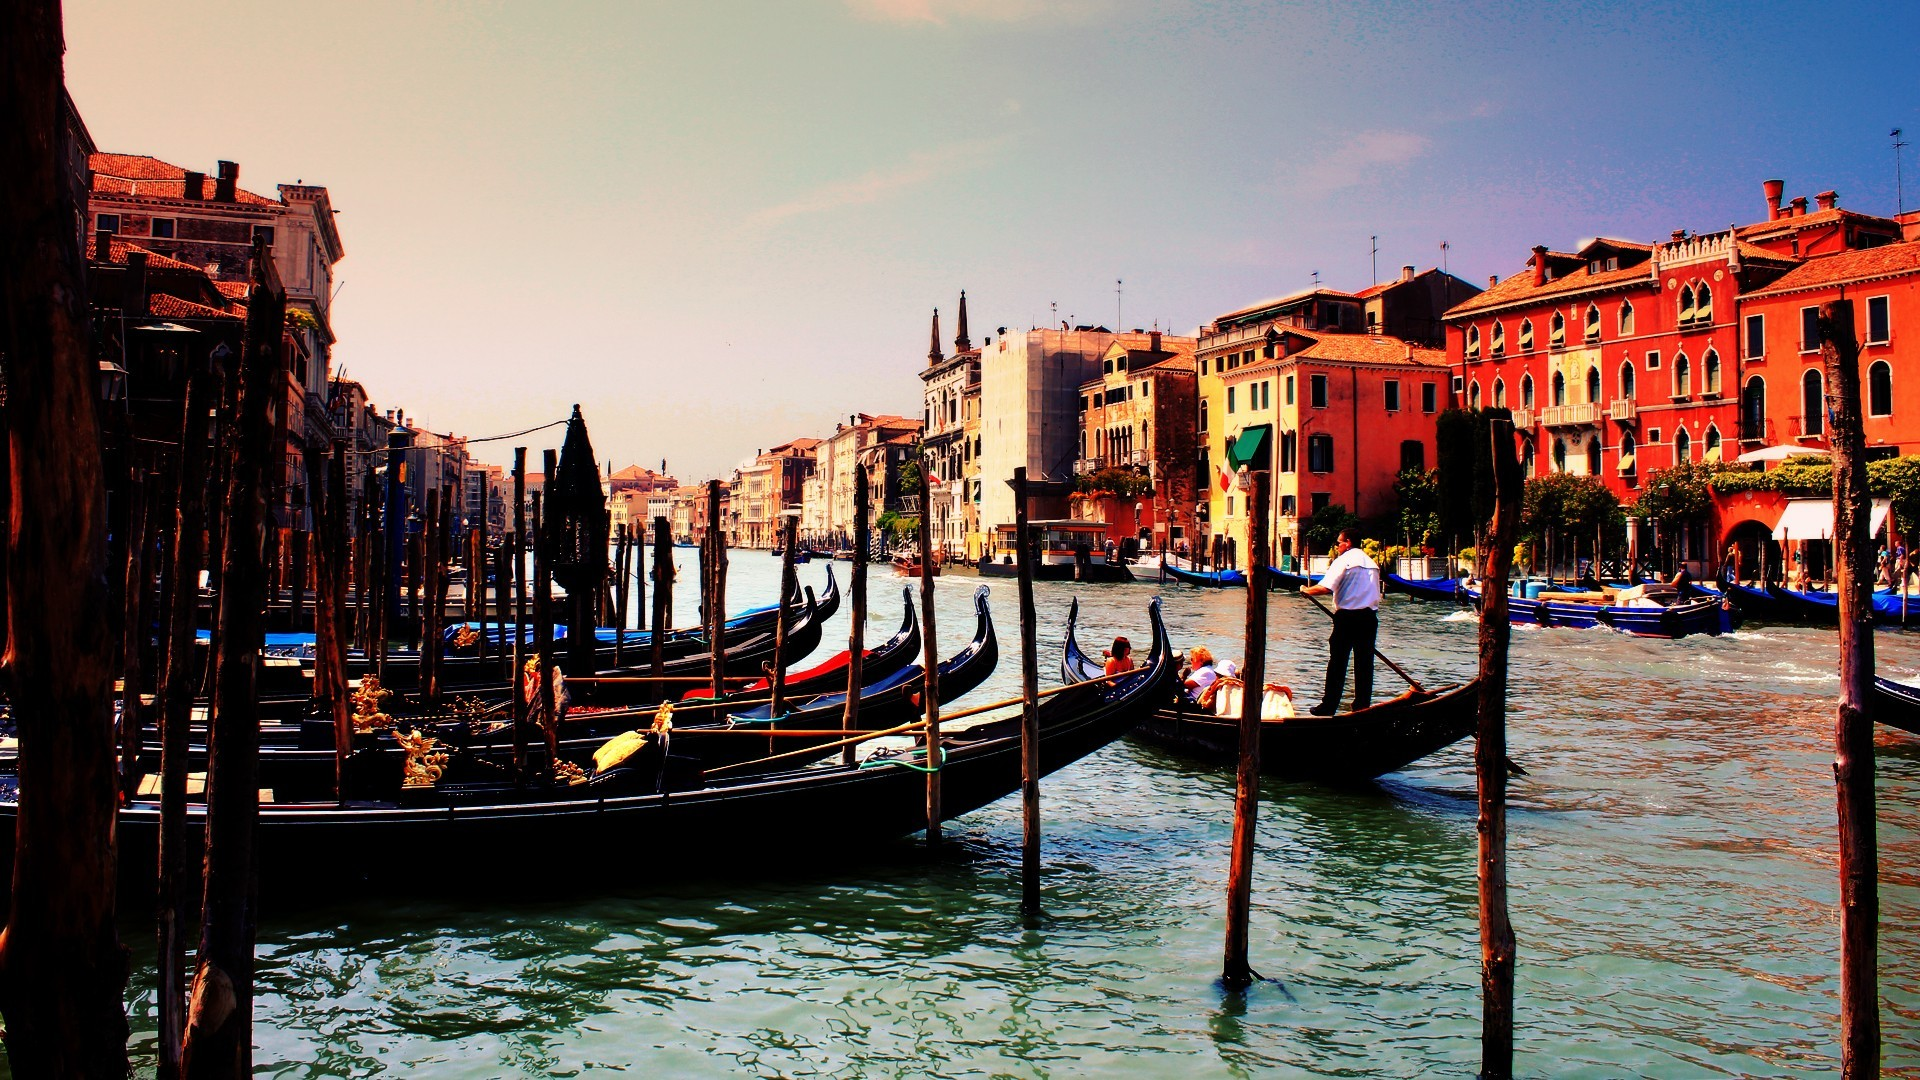 Sunset Over Grand Canal, Venice, Italy  № 1471191 бесплатно